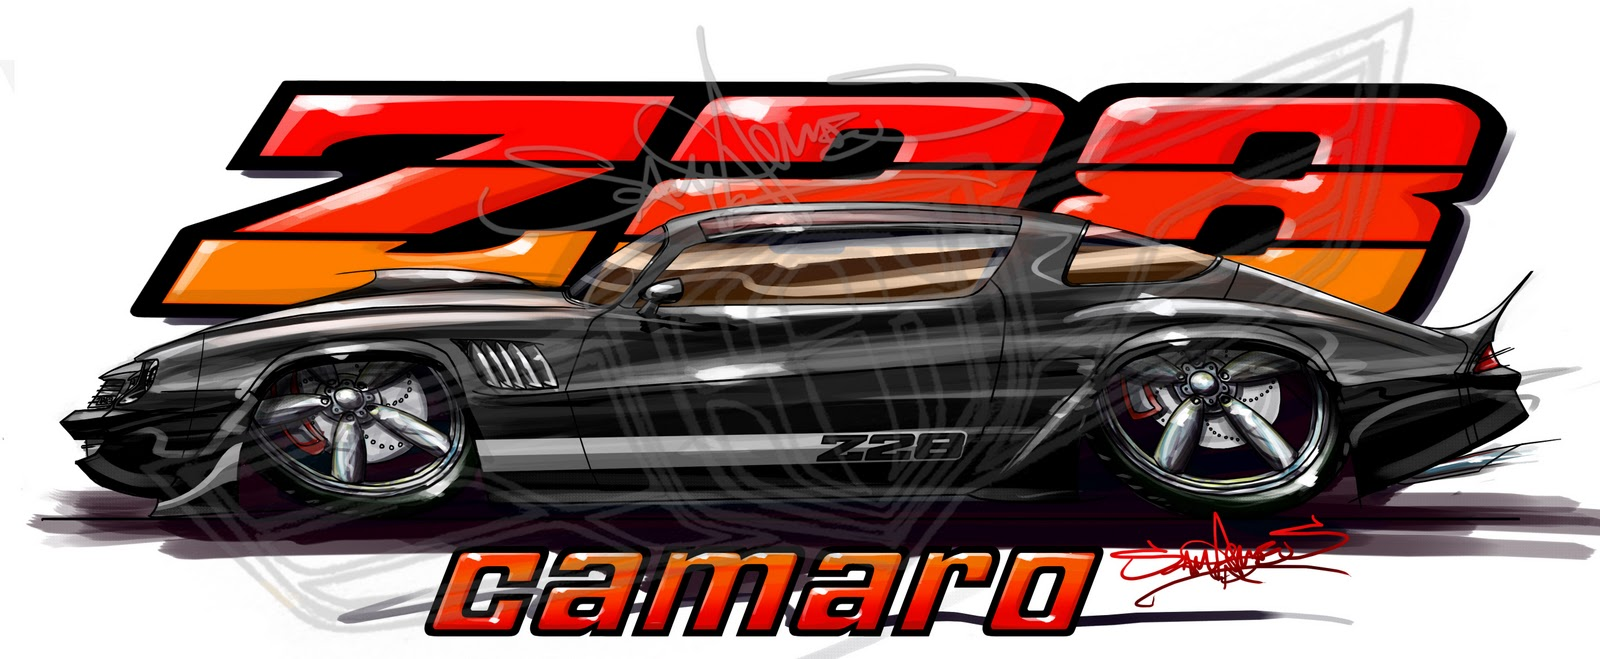 Sam ames 1979 1980 camaro z28 resurrected for 1980 camaro rear window louvers